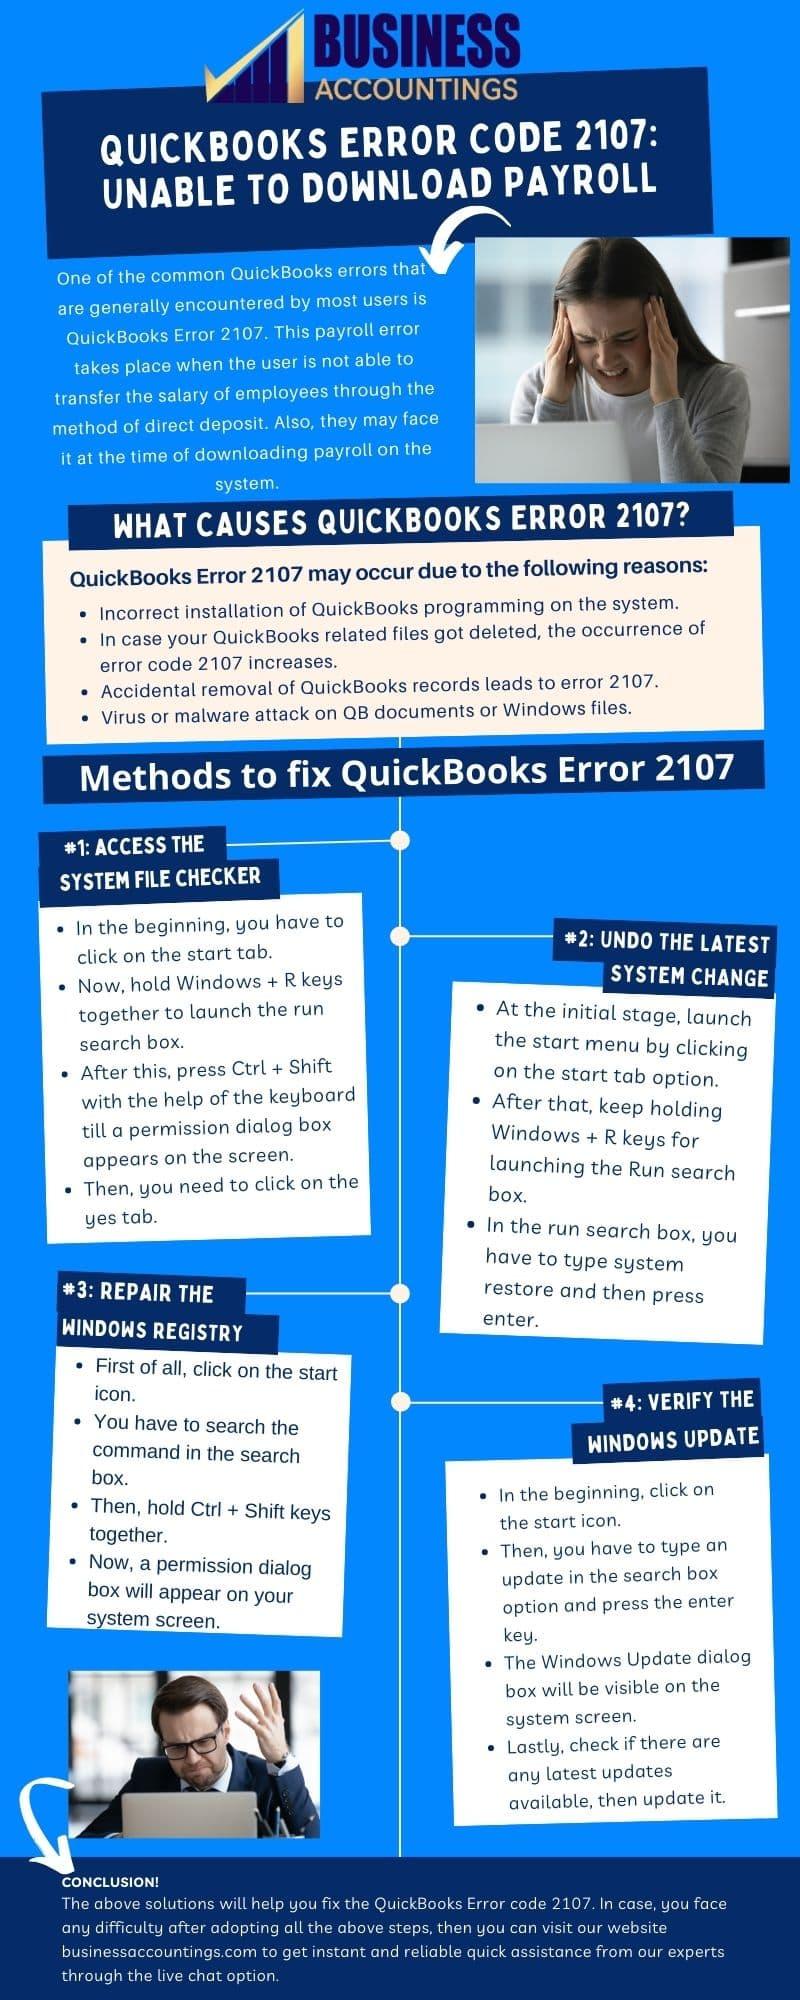 Infographics of Solutions for Quickbooks Error Code 2107